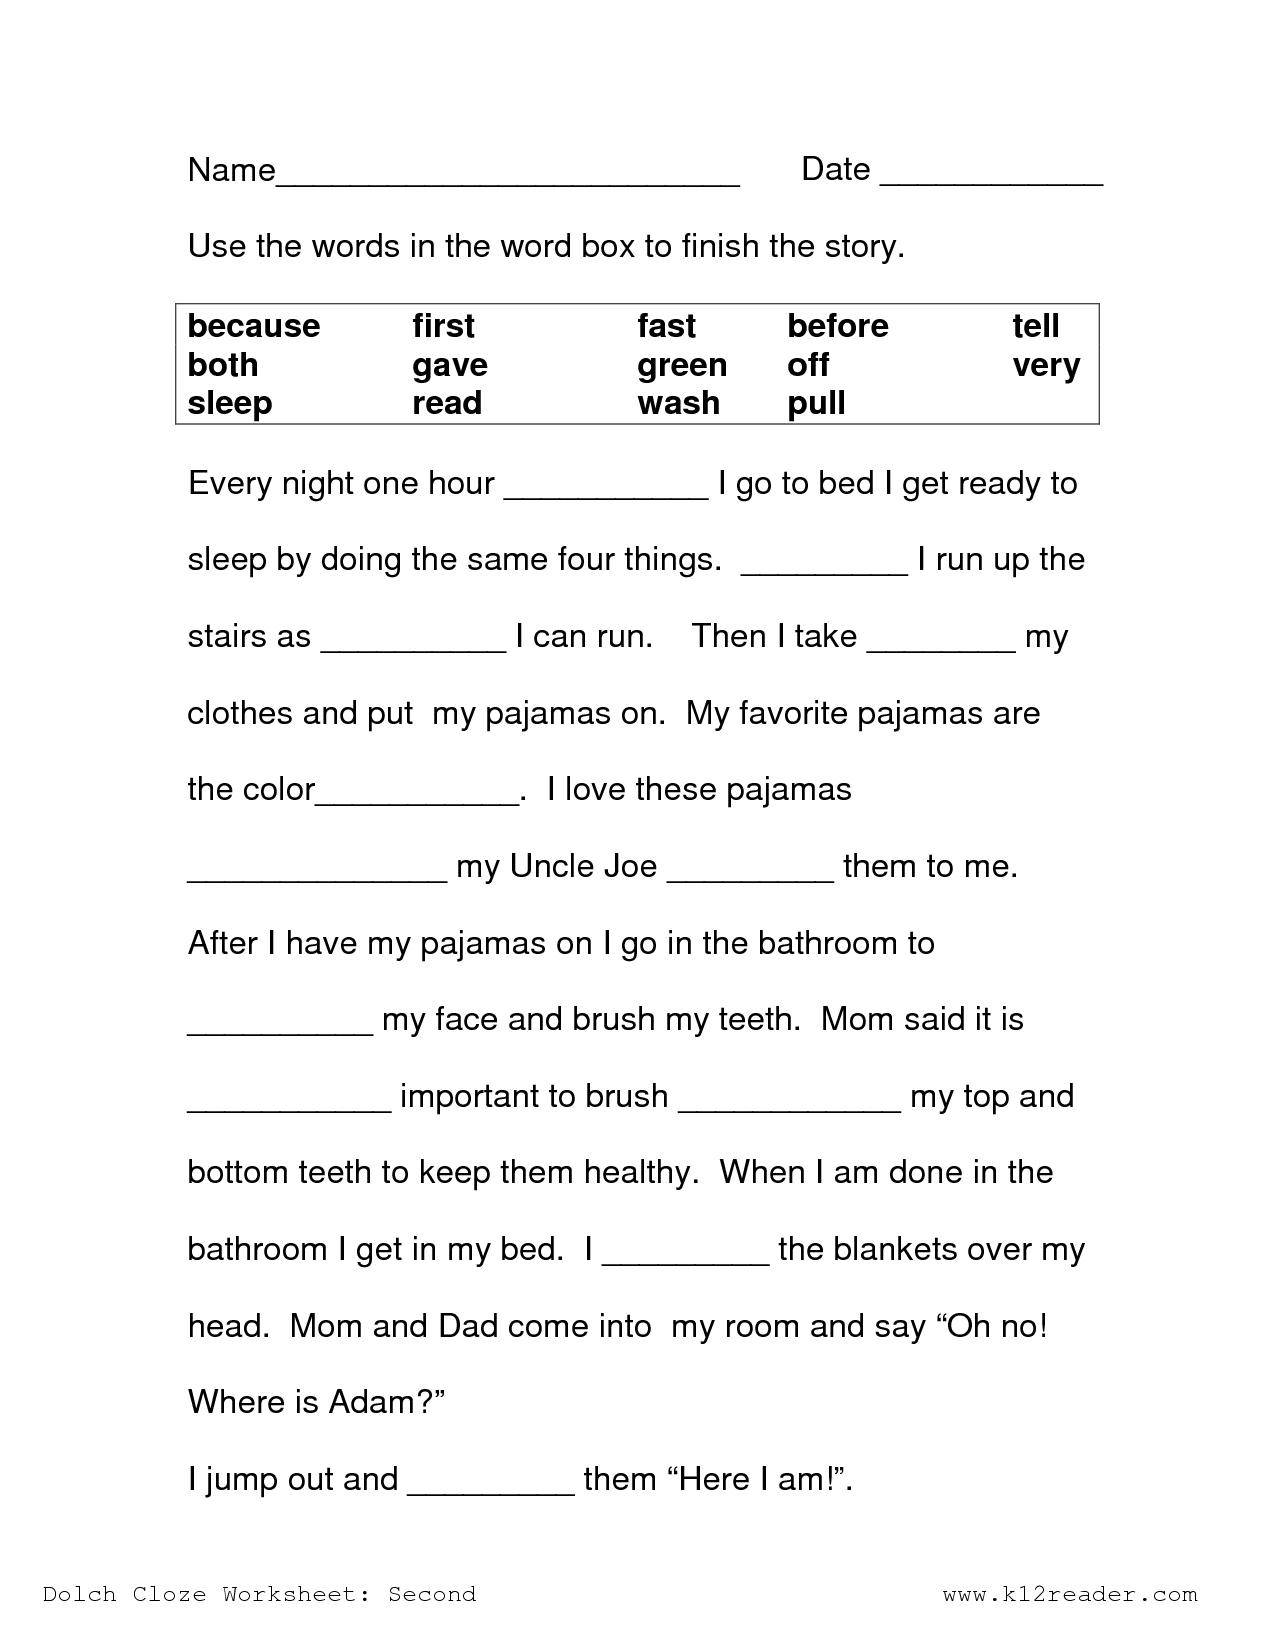 Free Printable Reading Comprehension Worksheets 3Rd Grade To Print | Free Printable 3Rd Grade Reading Worksheets